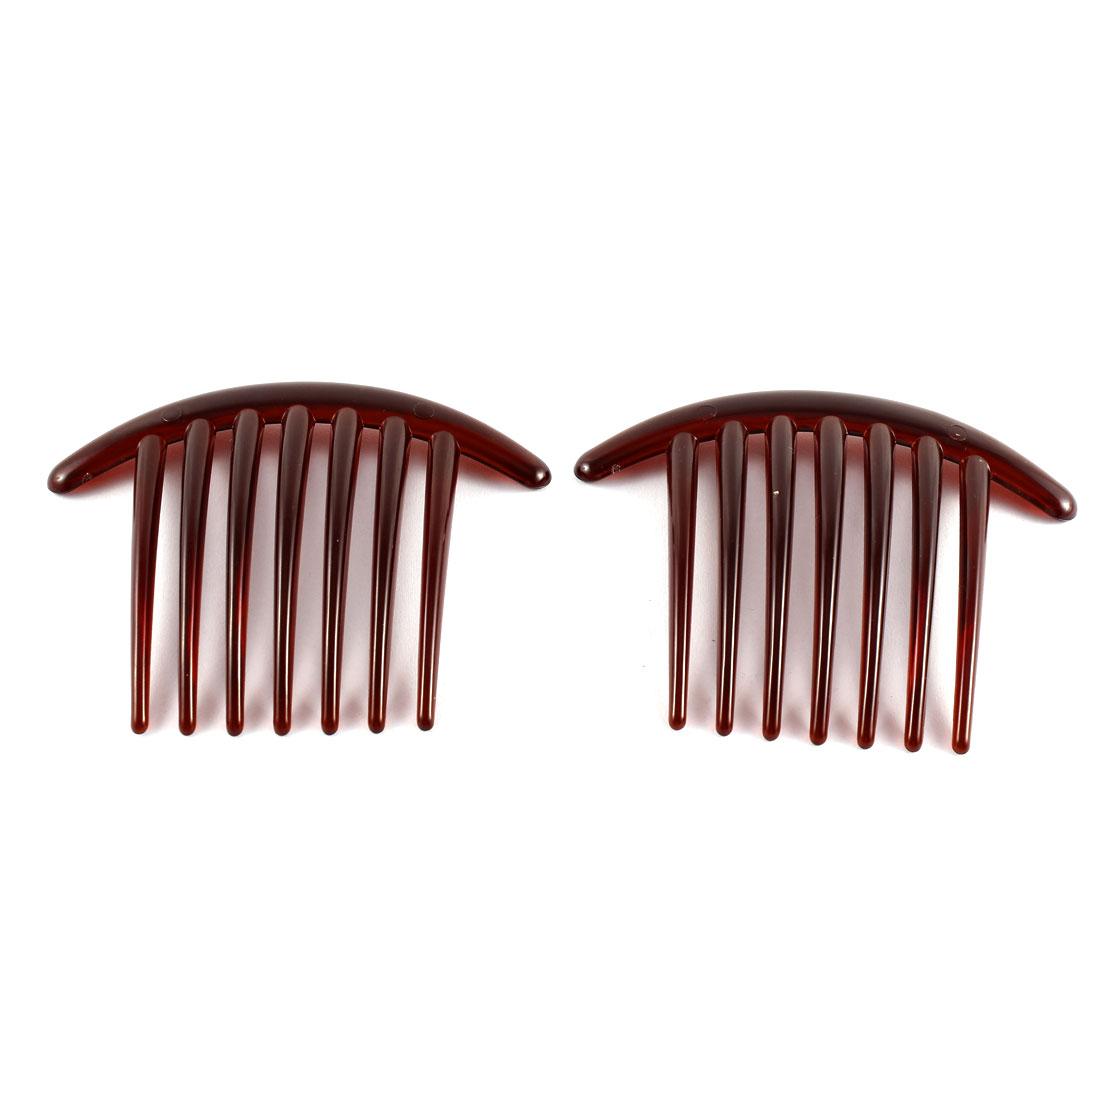 Lady Woman 7 Teeth Plastic Hair Comb Clip Hairclip Clamp Dark Red 2 Pcs